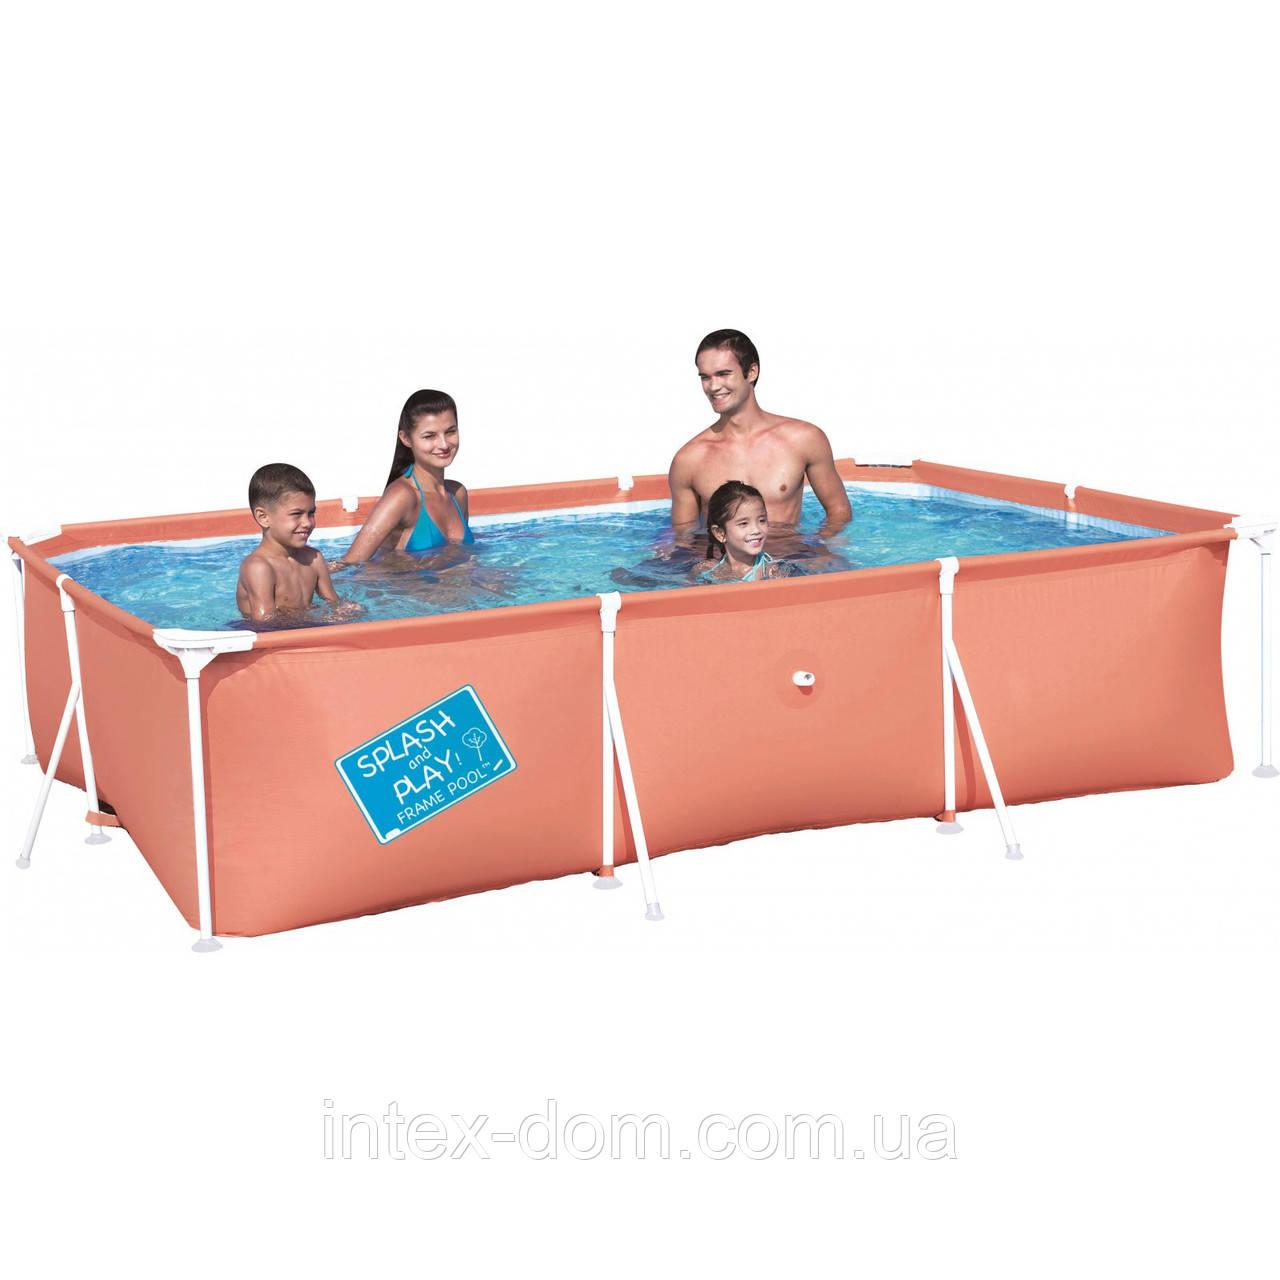 Детский каркасный бассейн Bestway 56222 B (Голубой), размер 300 х 201 х 66 см